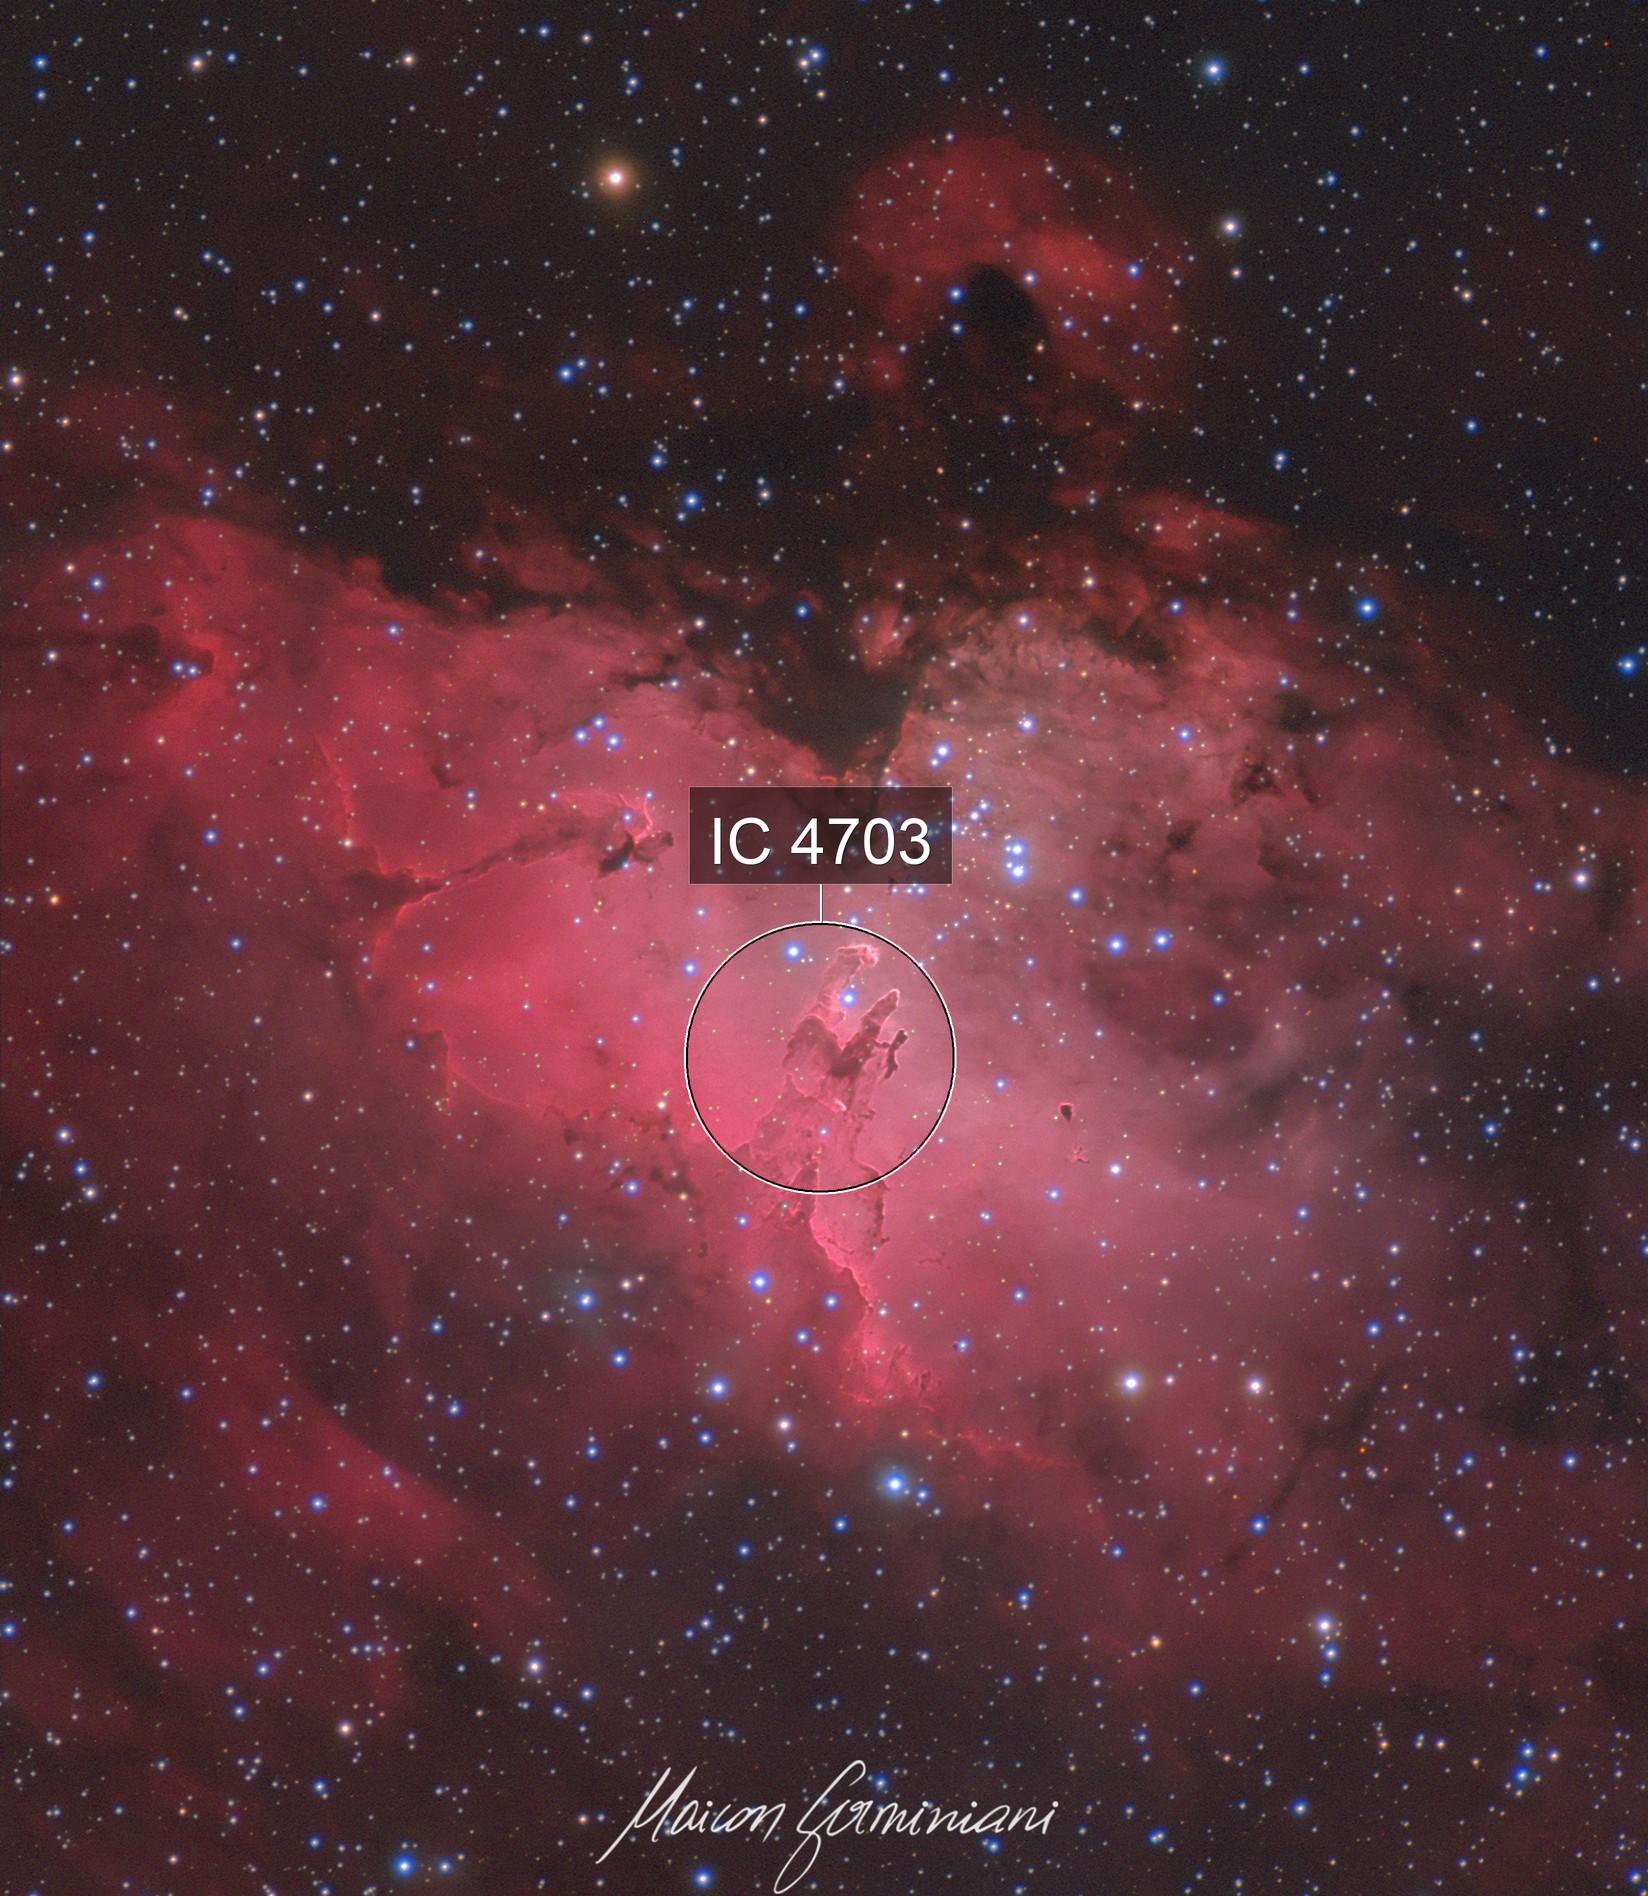 Queen Nebula Messier 16 Eagle Nebula